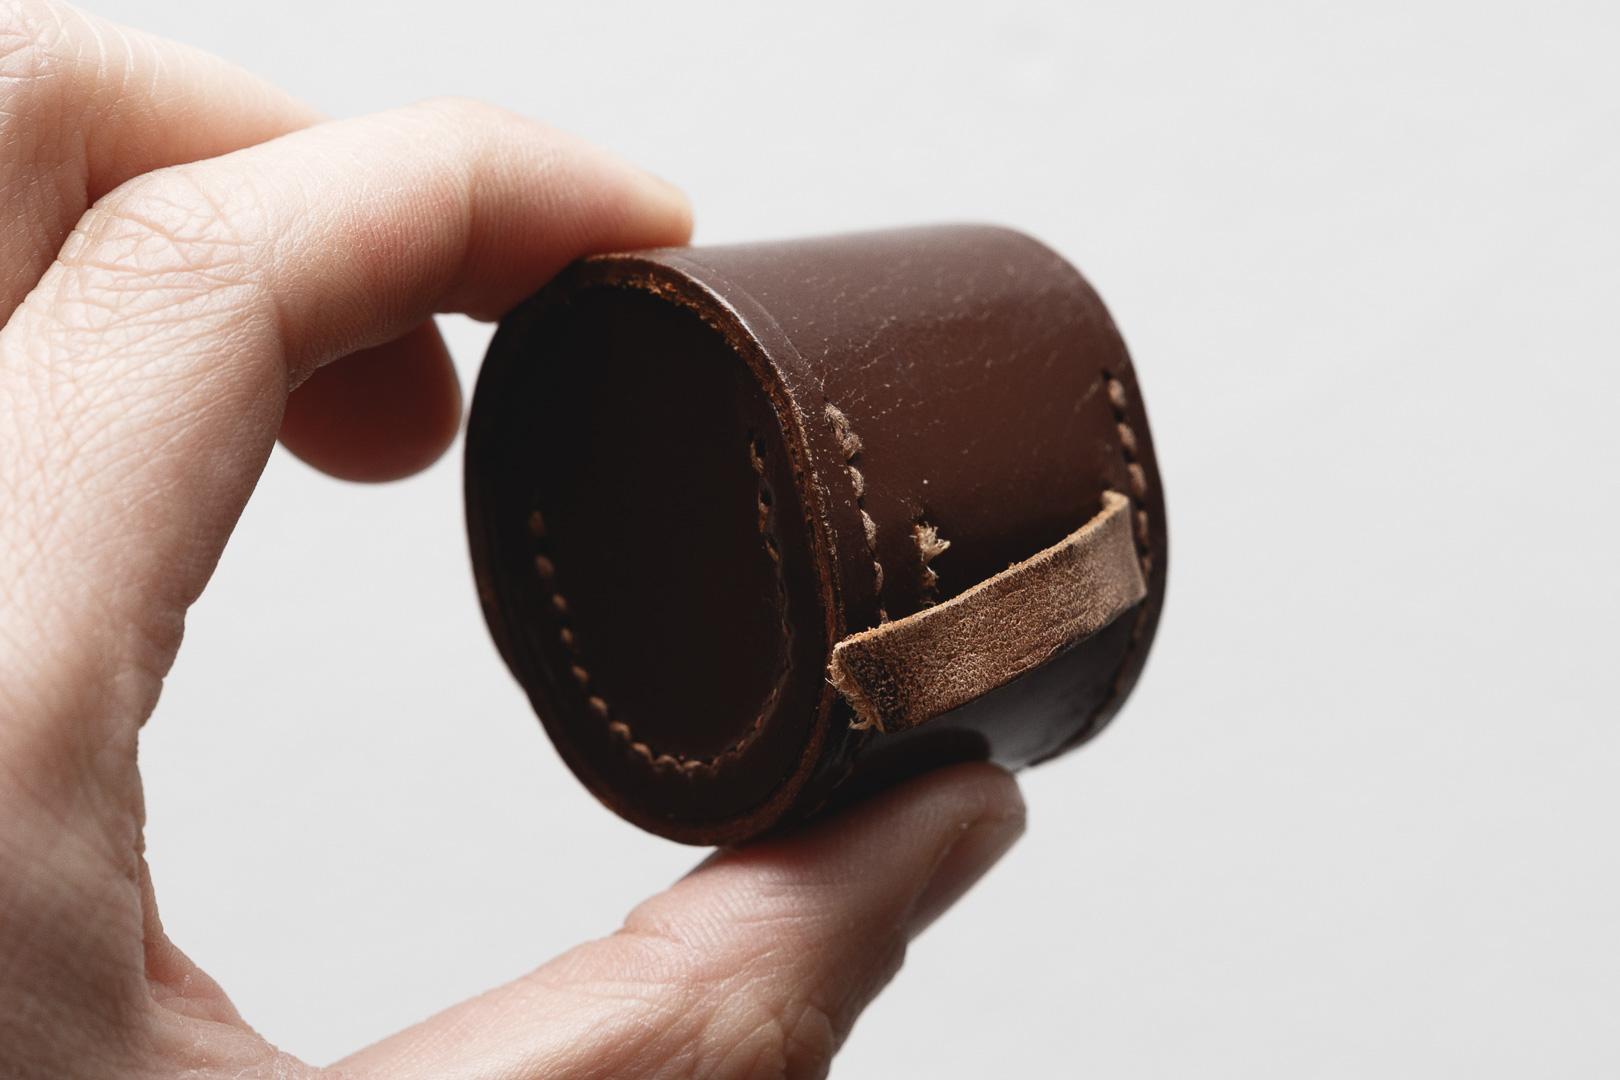 Diax-35mm-finder-Ant Tran-20170402-2989.jpg